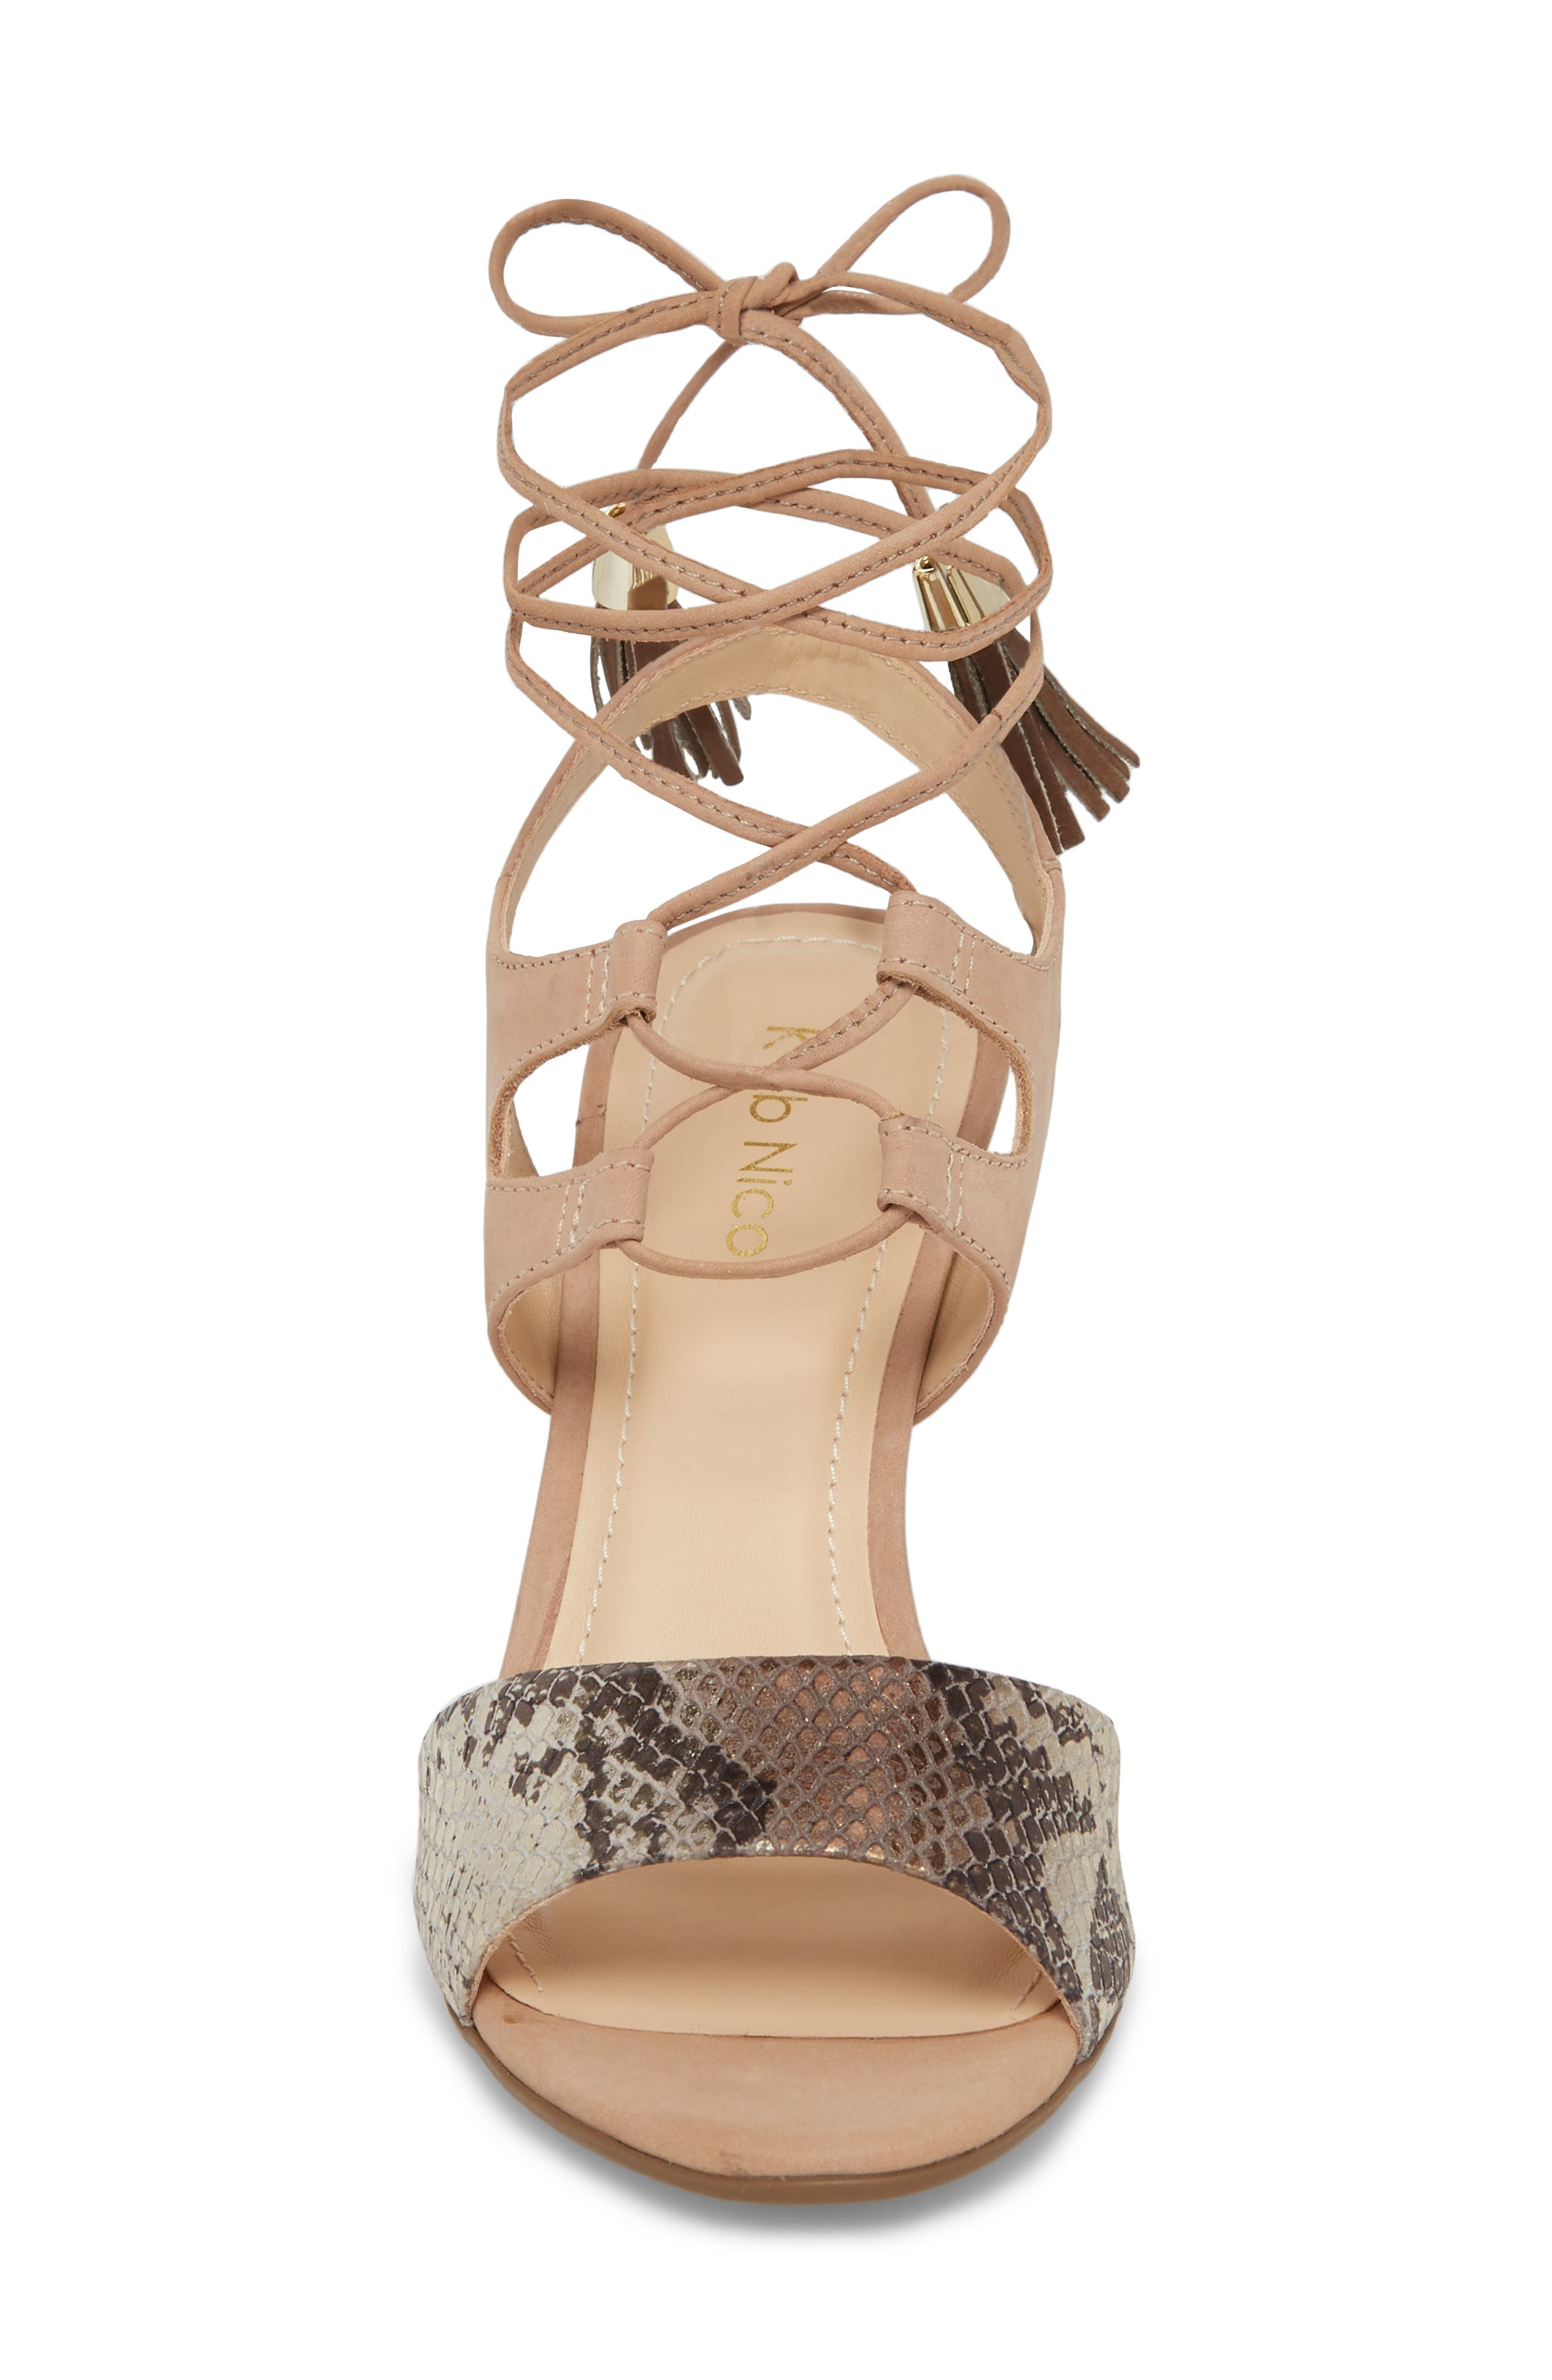 Kaira Ankle Wrap Sandal,                             Alternate thumbnail 4, color,                             Snake Print Leather